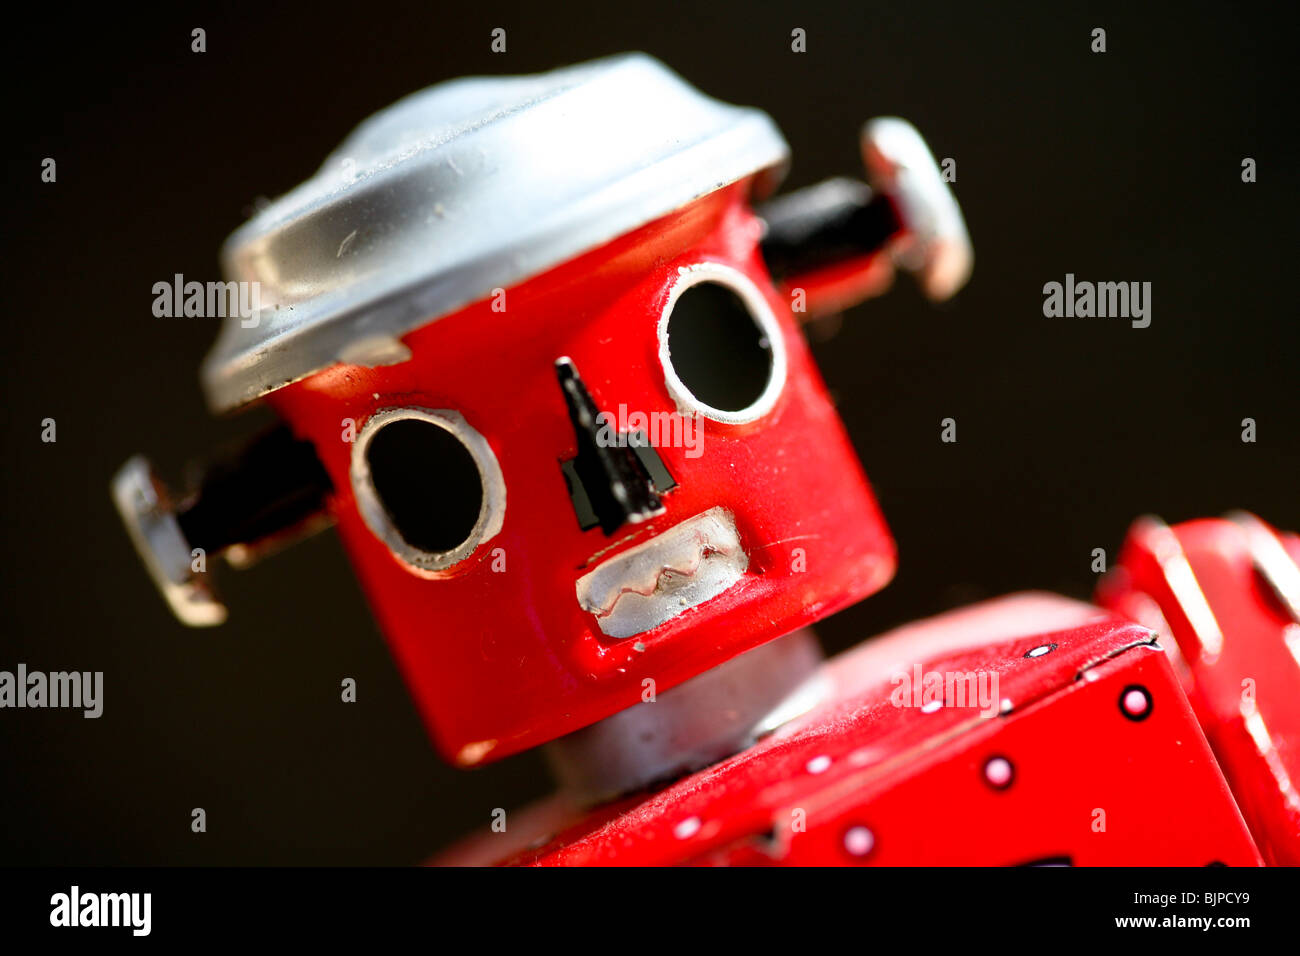 Retro red Tinplate Robot toy - Stock Image